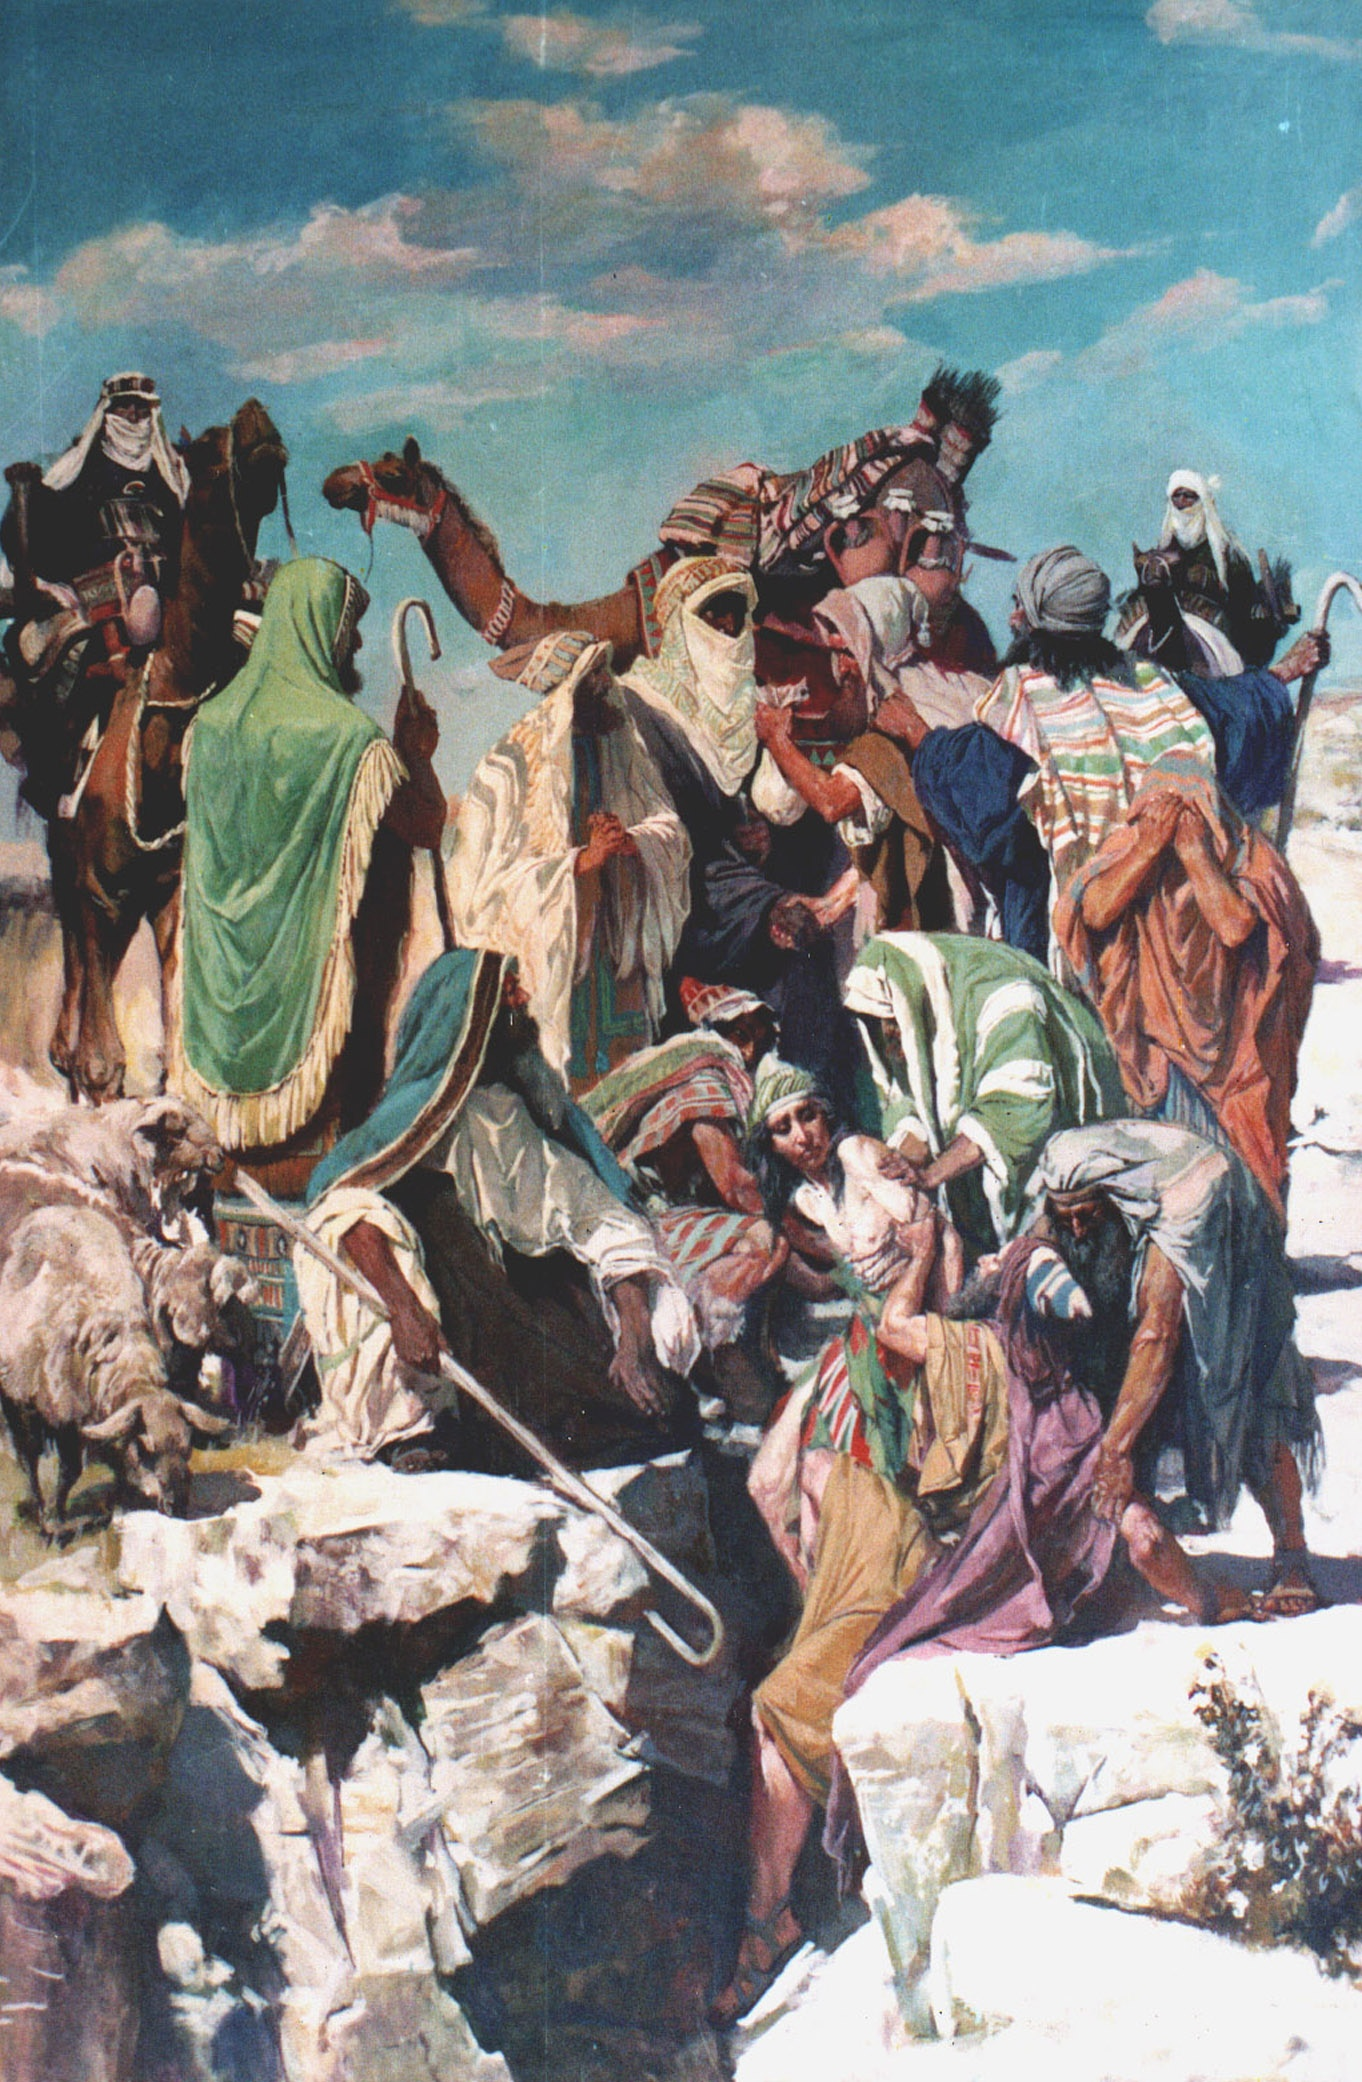 Продаж Йосифа в рабство